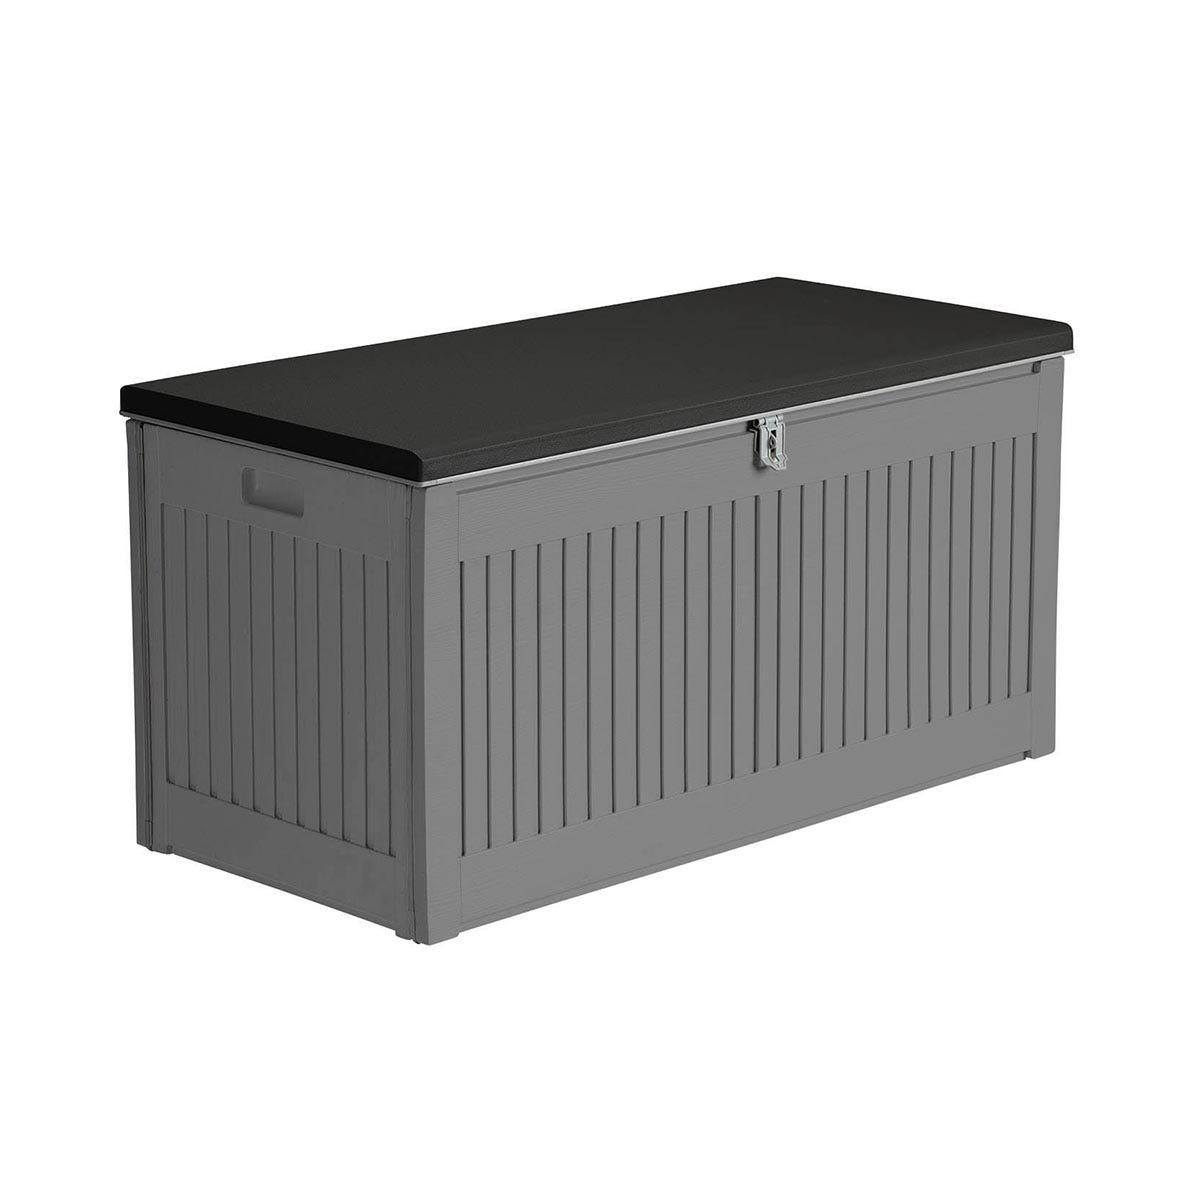 Airwave 72 Gal/270L Plastic Storage Box - Grey